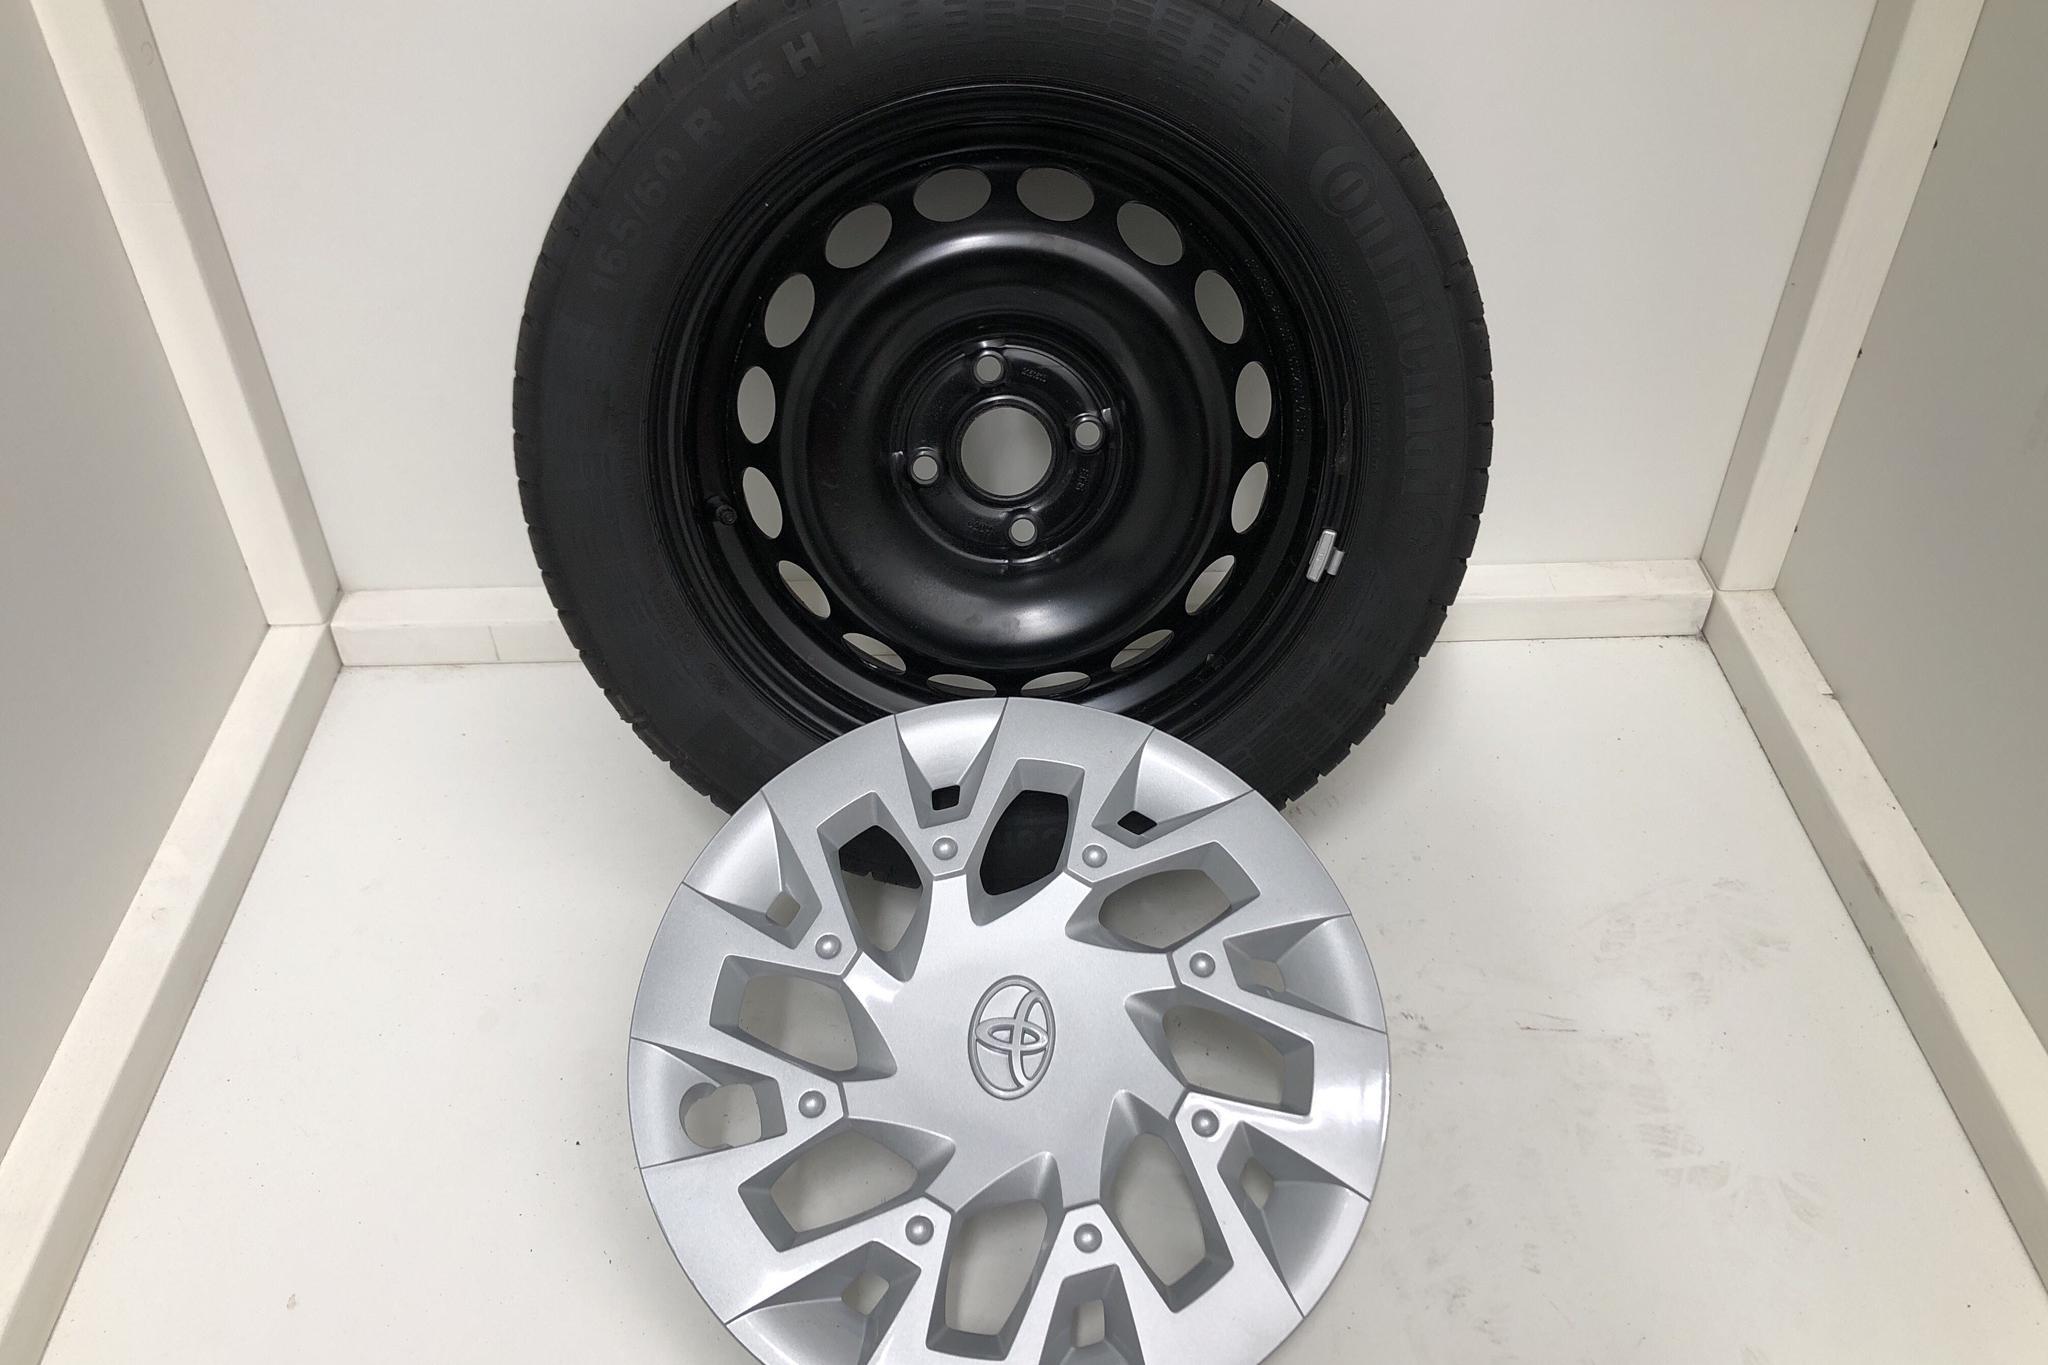 Toyota Aygo 1.0 5dr (72hk) - 72 mil - Manuell - röd - 2021